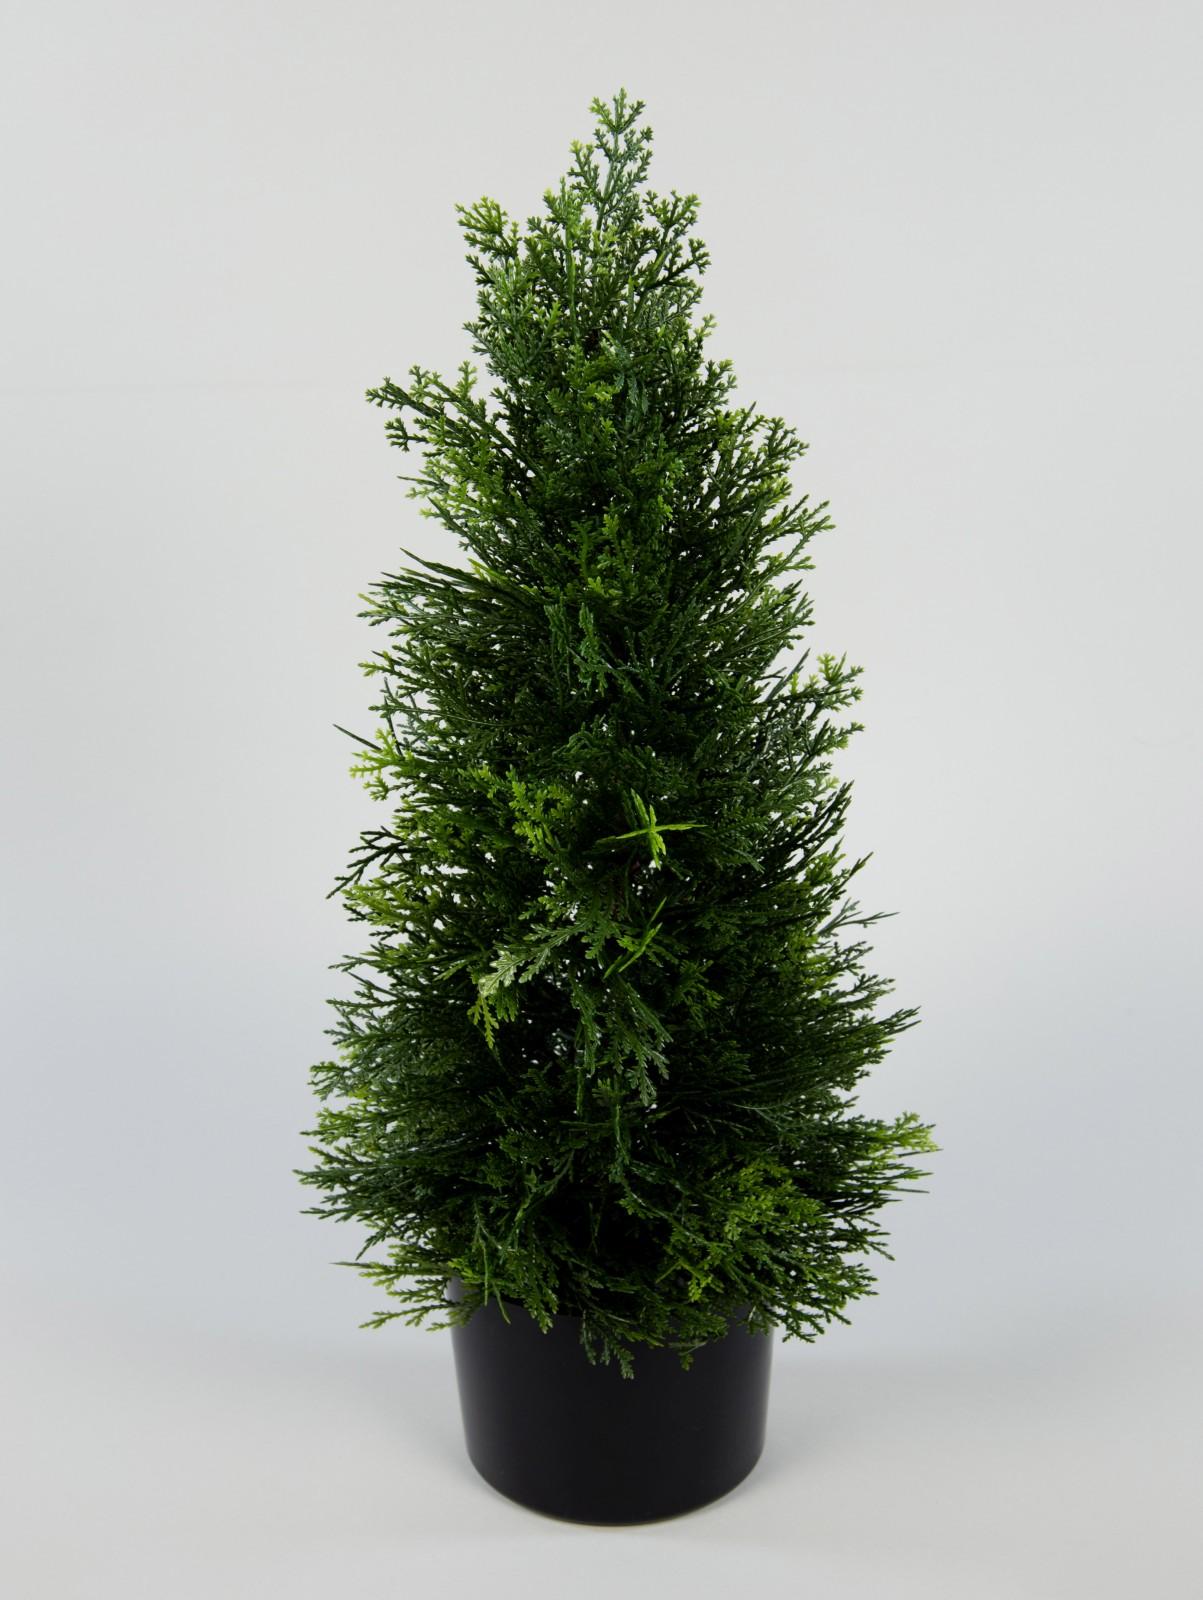 zeder konifere natura 60cm gr n la kunstpflanzen k nstliche pflanzen thuja ebay. Black Bedroom Furniture Sets. Home Design Ideas